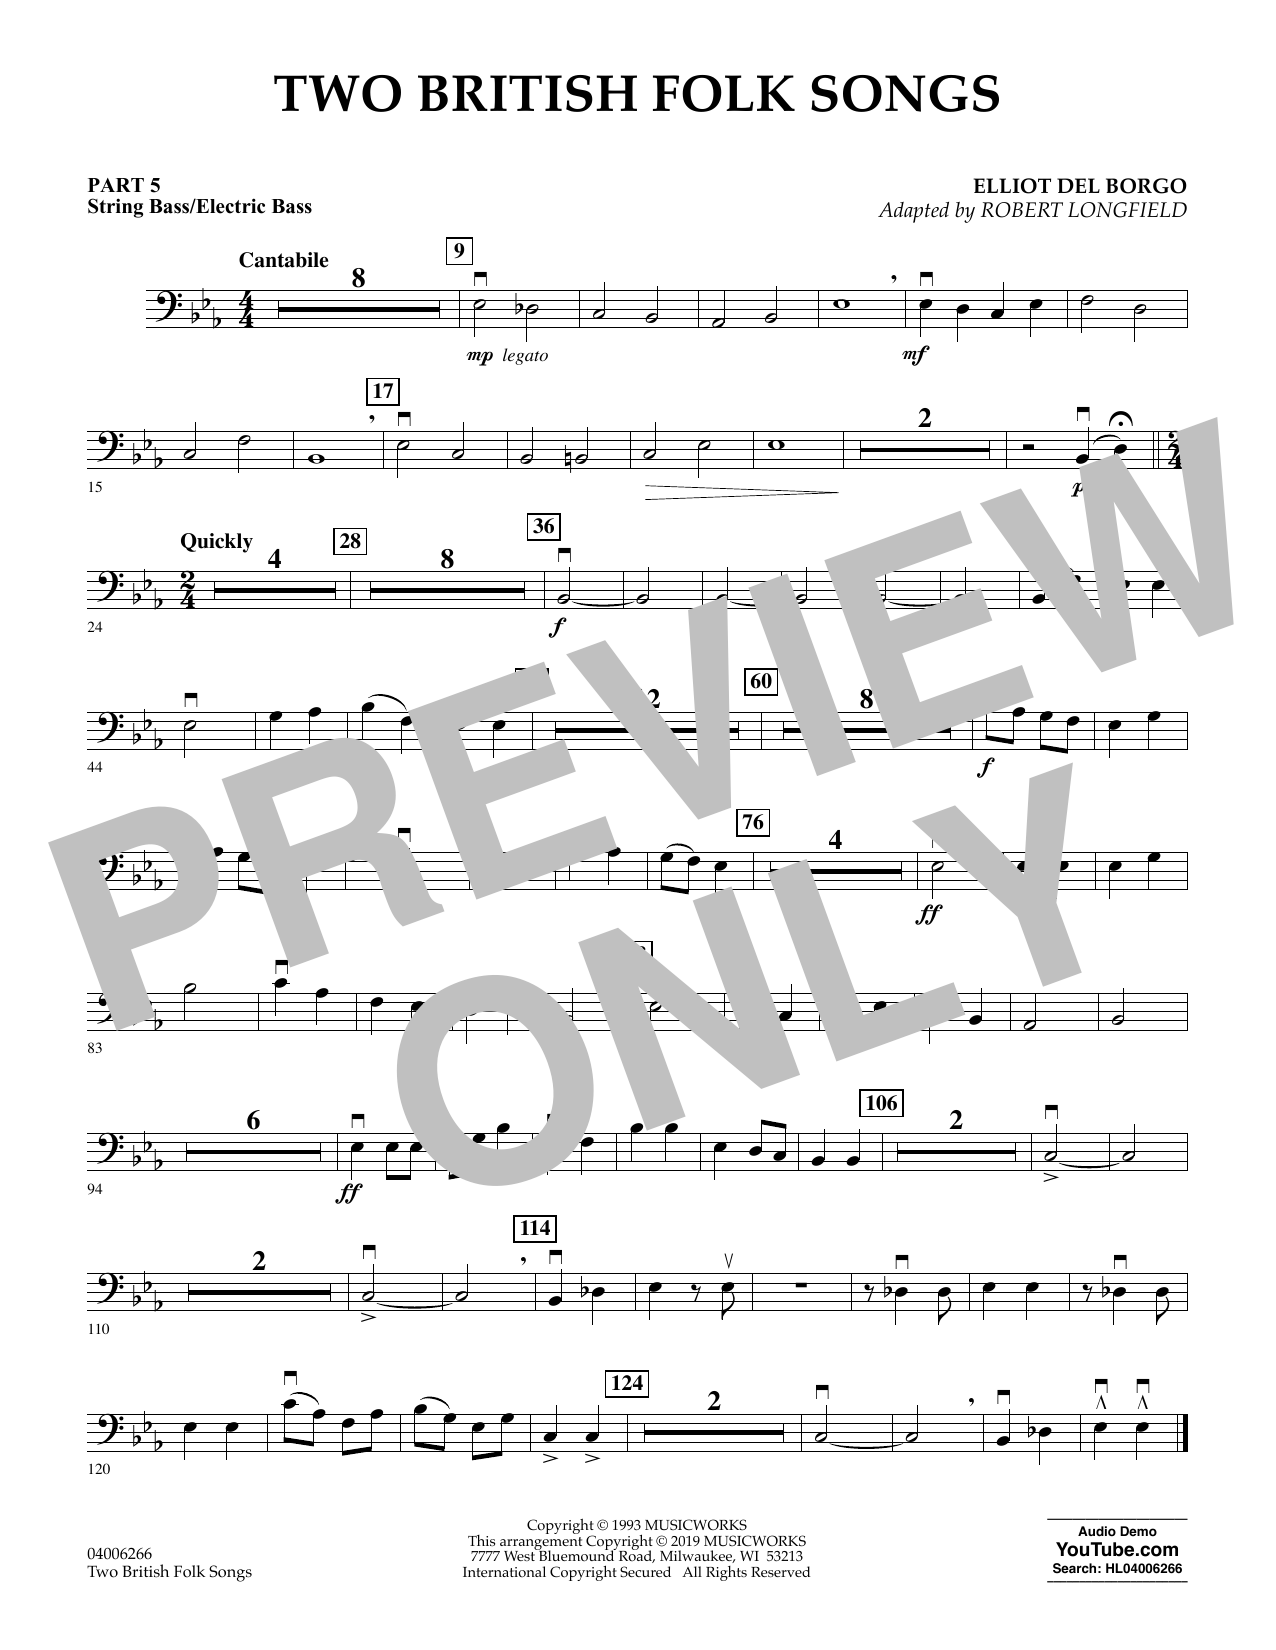 Two British Folk Songs (arr. Robert Longfield) - Pt.5 - String/Electric Bass (Concert Band)